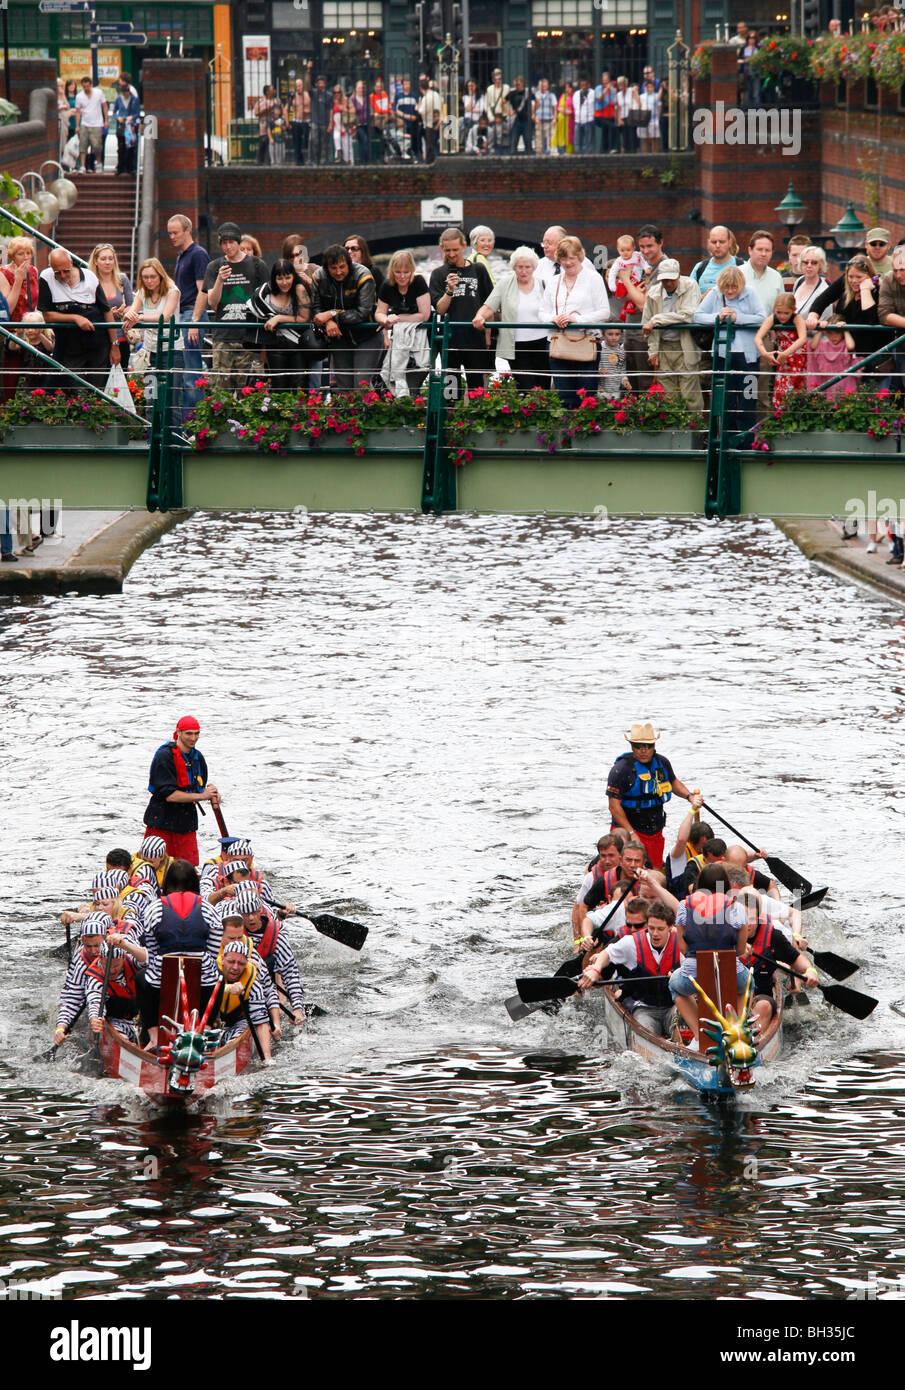 Dragon Boat racing sul canal a Brindleyplace, Birmingham. Immagini Stock